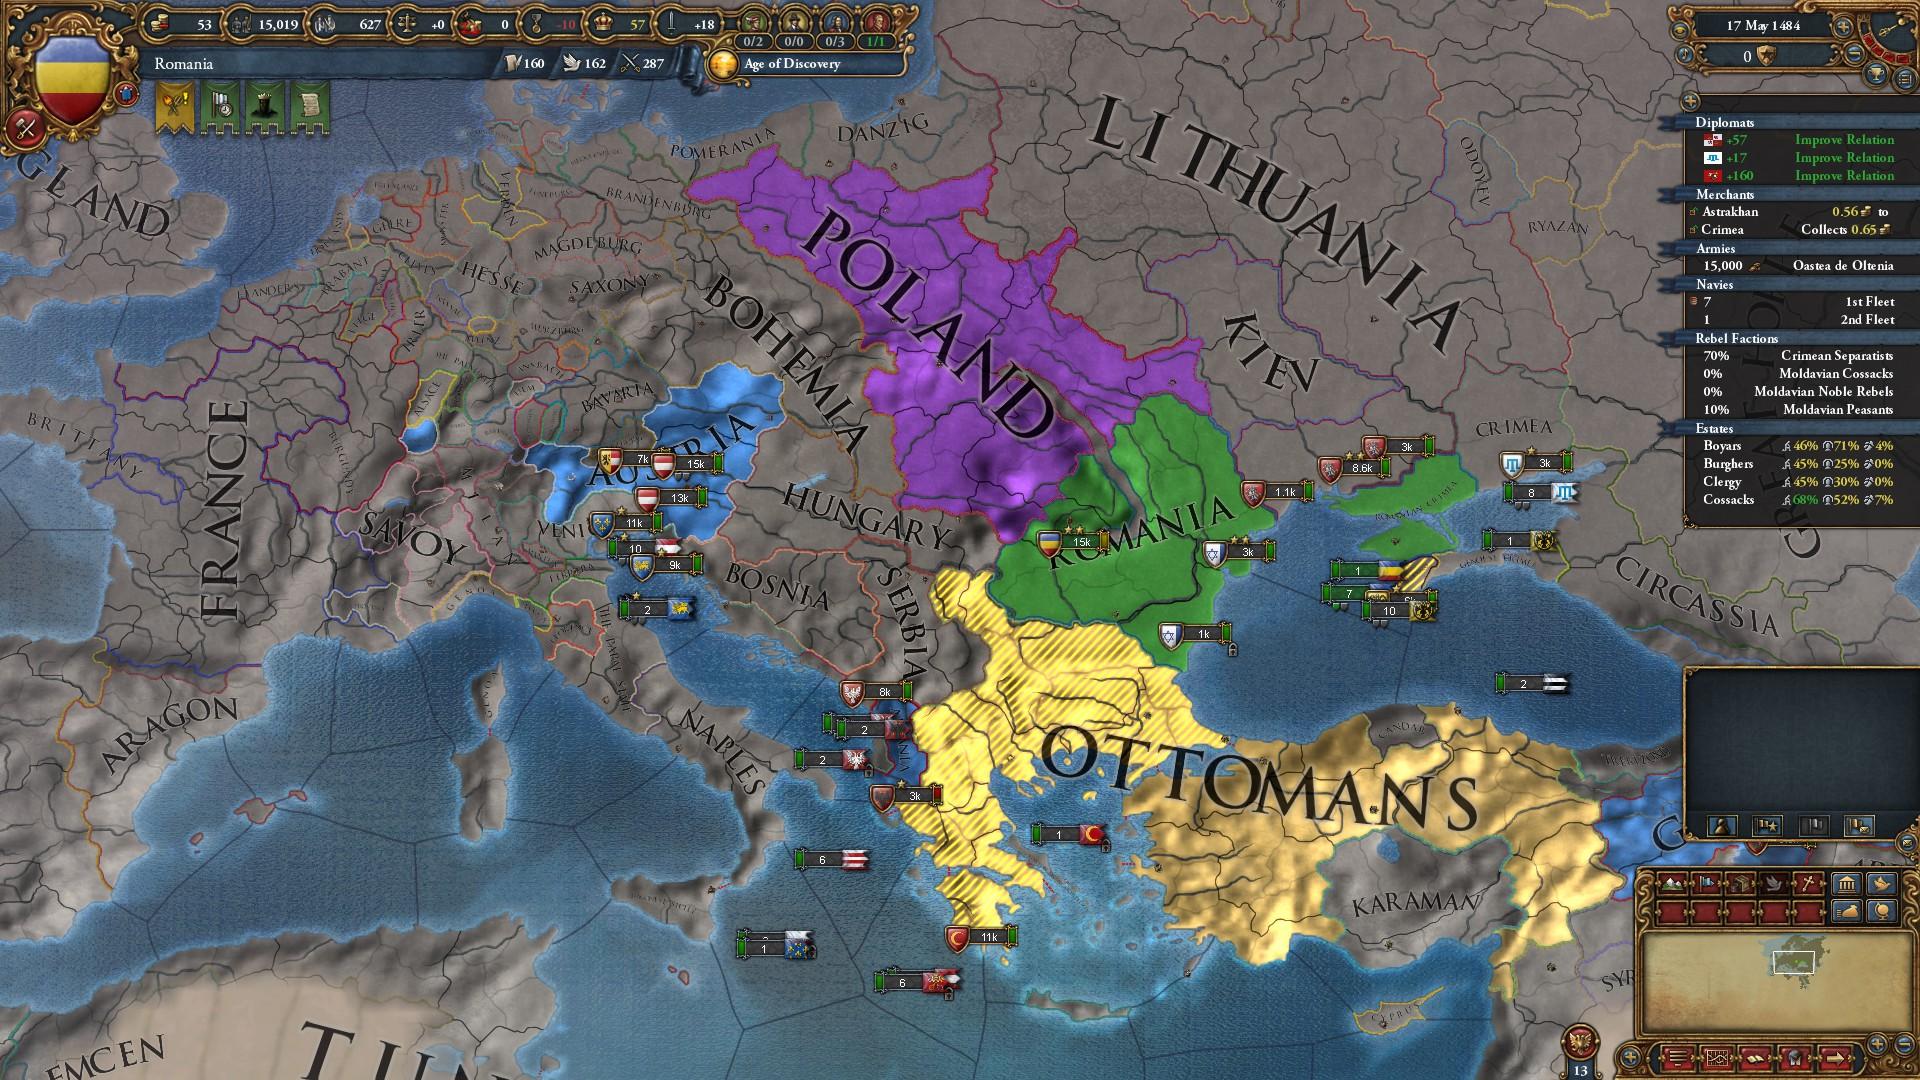 dracula s revenge conquering